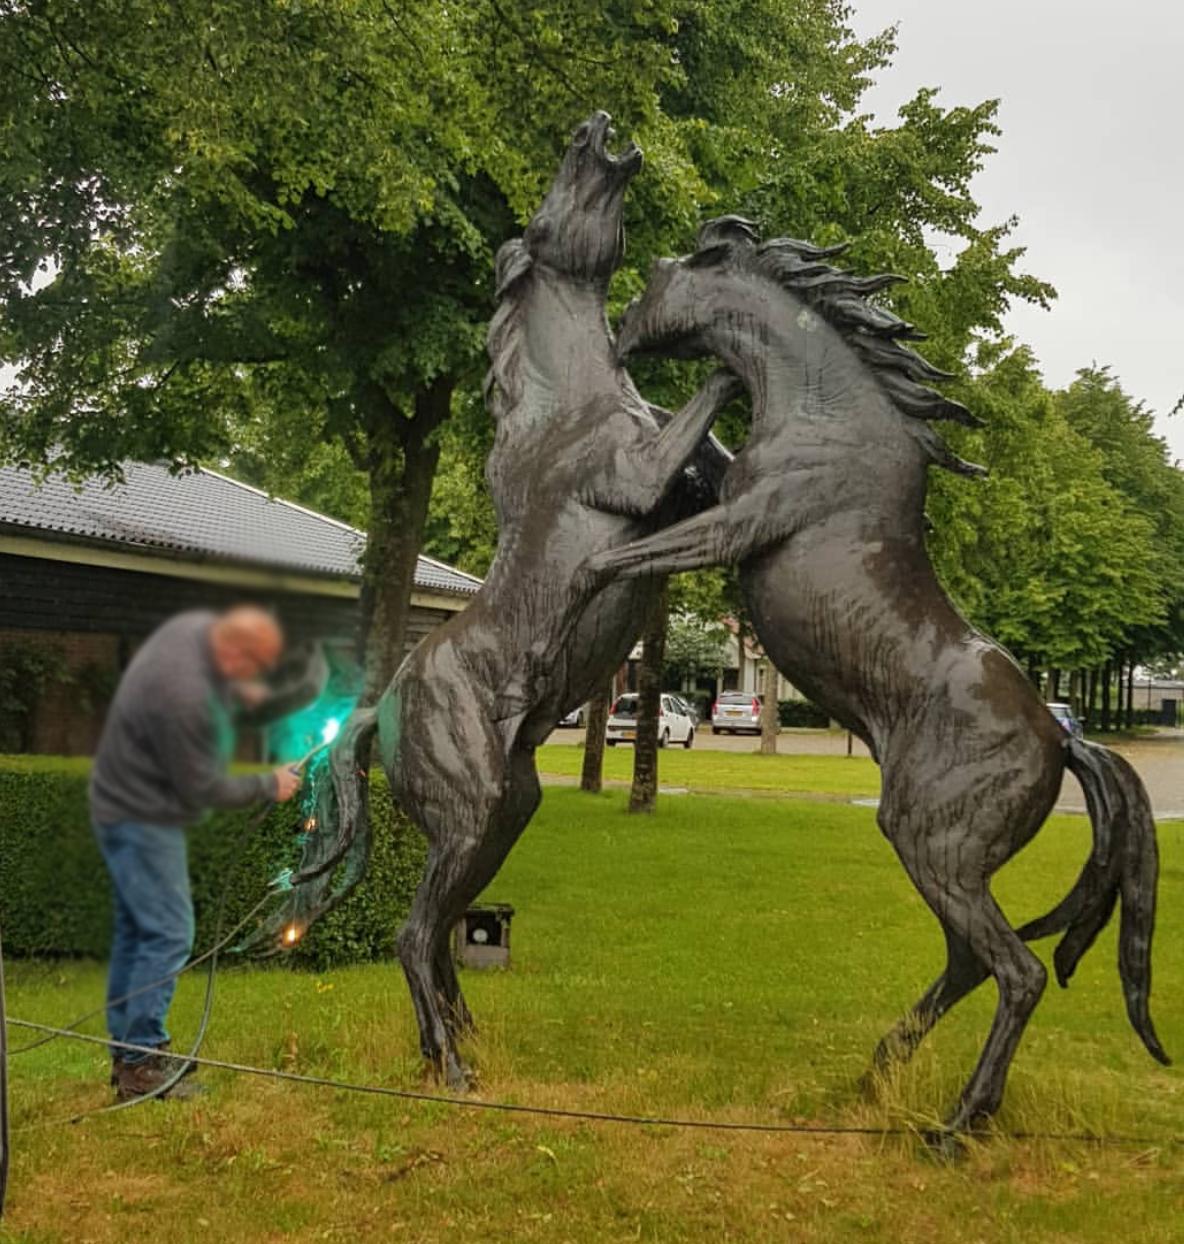 Two bronze fighting horse sculpture